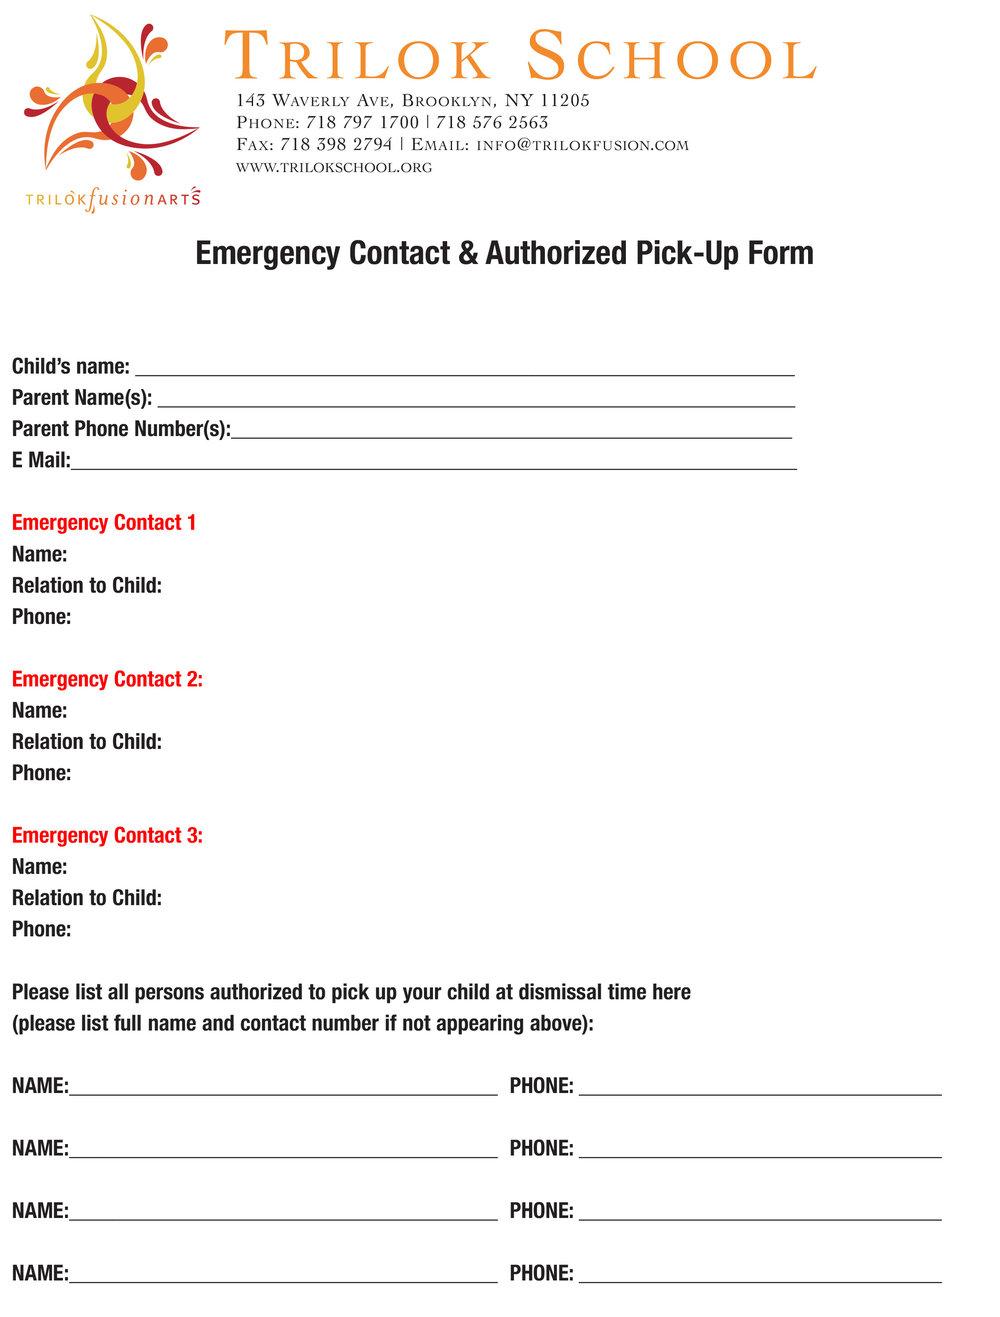 Emergencycontactform.jpg